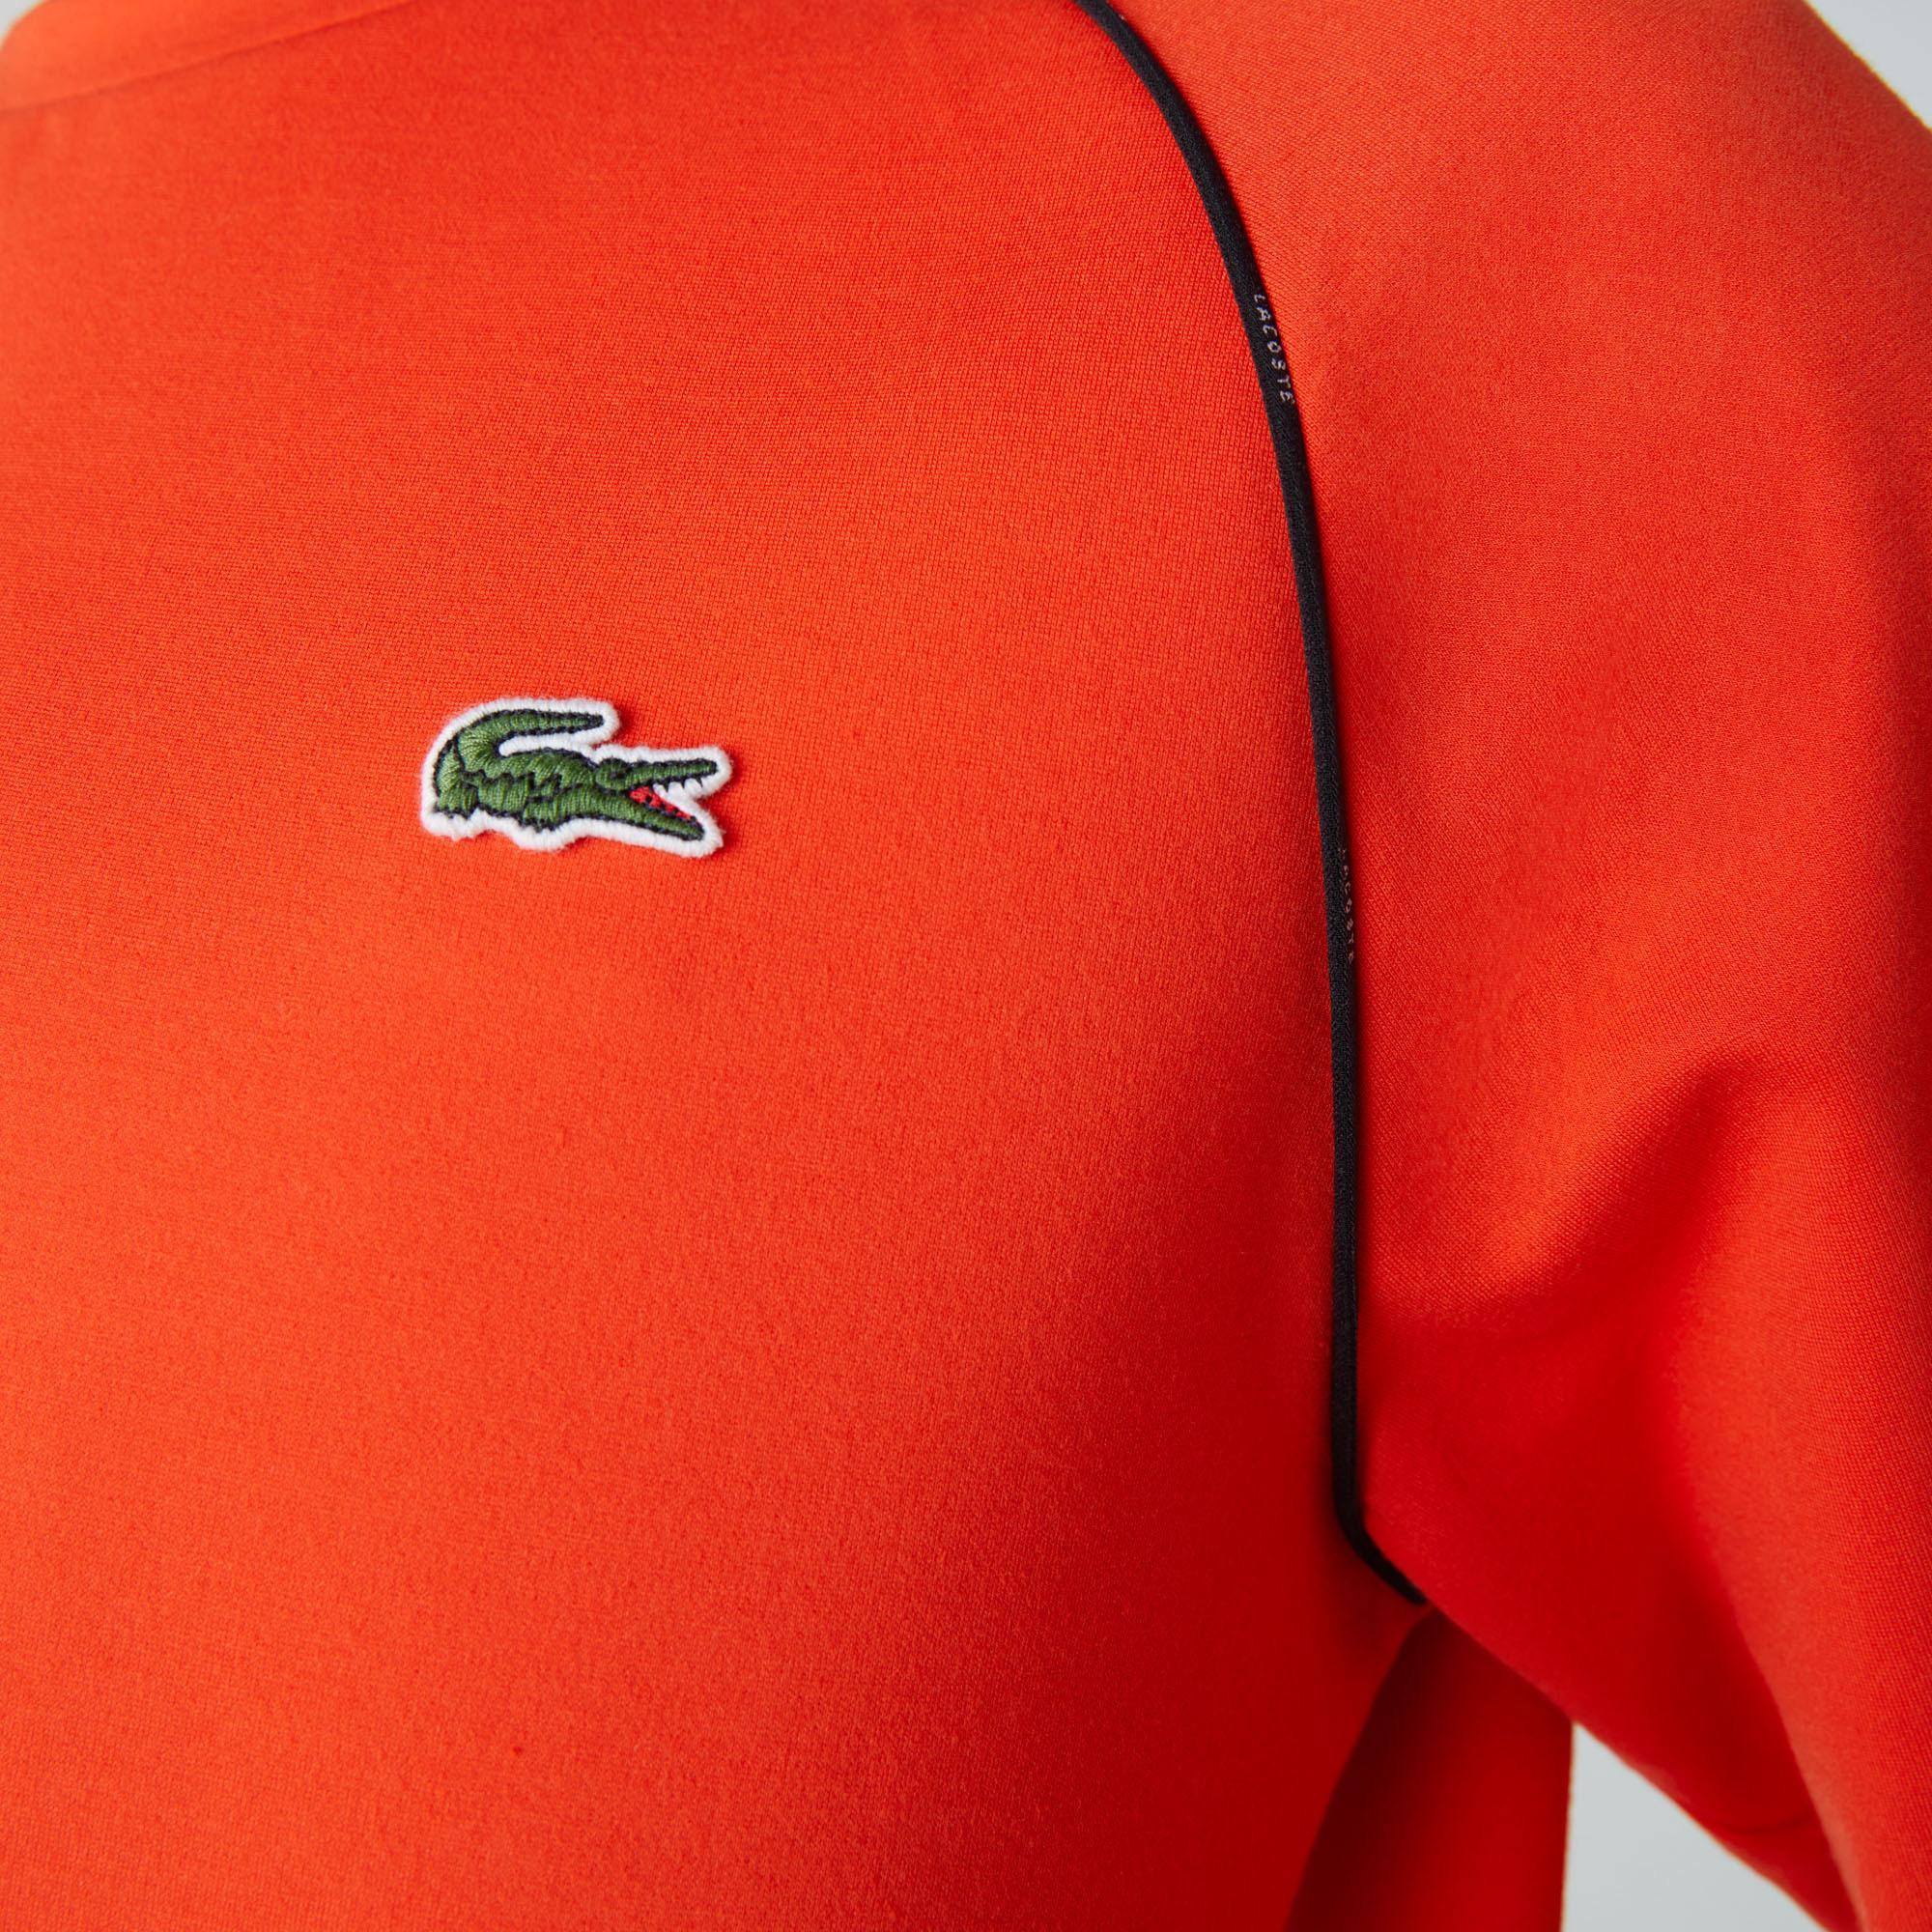 Lacoste Sport Erkek Bisiklet Yaka Uzun Kollu Turuncu T-Shirt